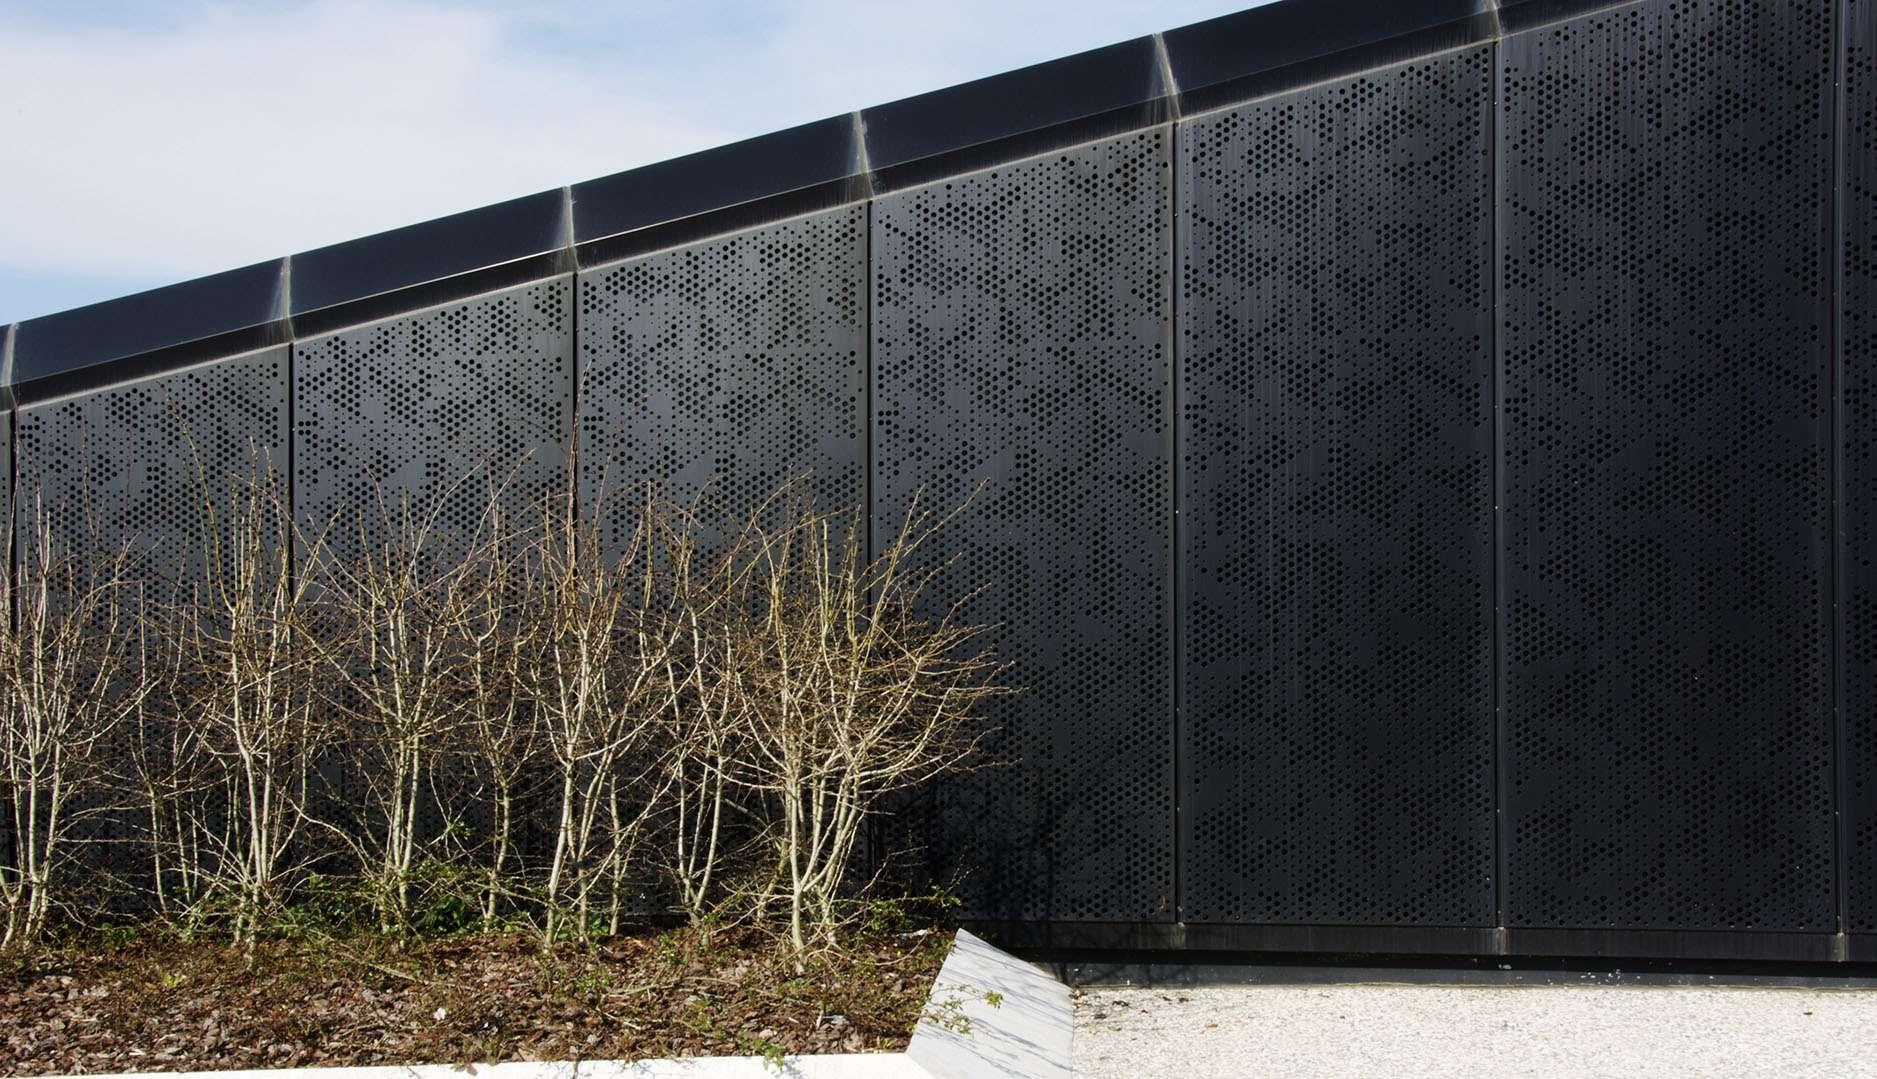 IMAR_Perforated panels